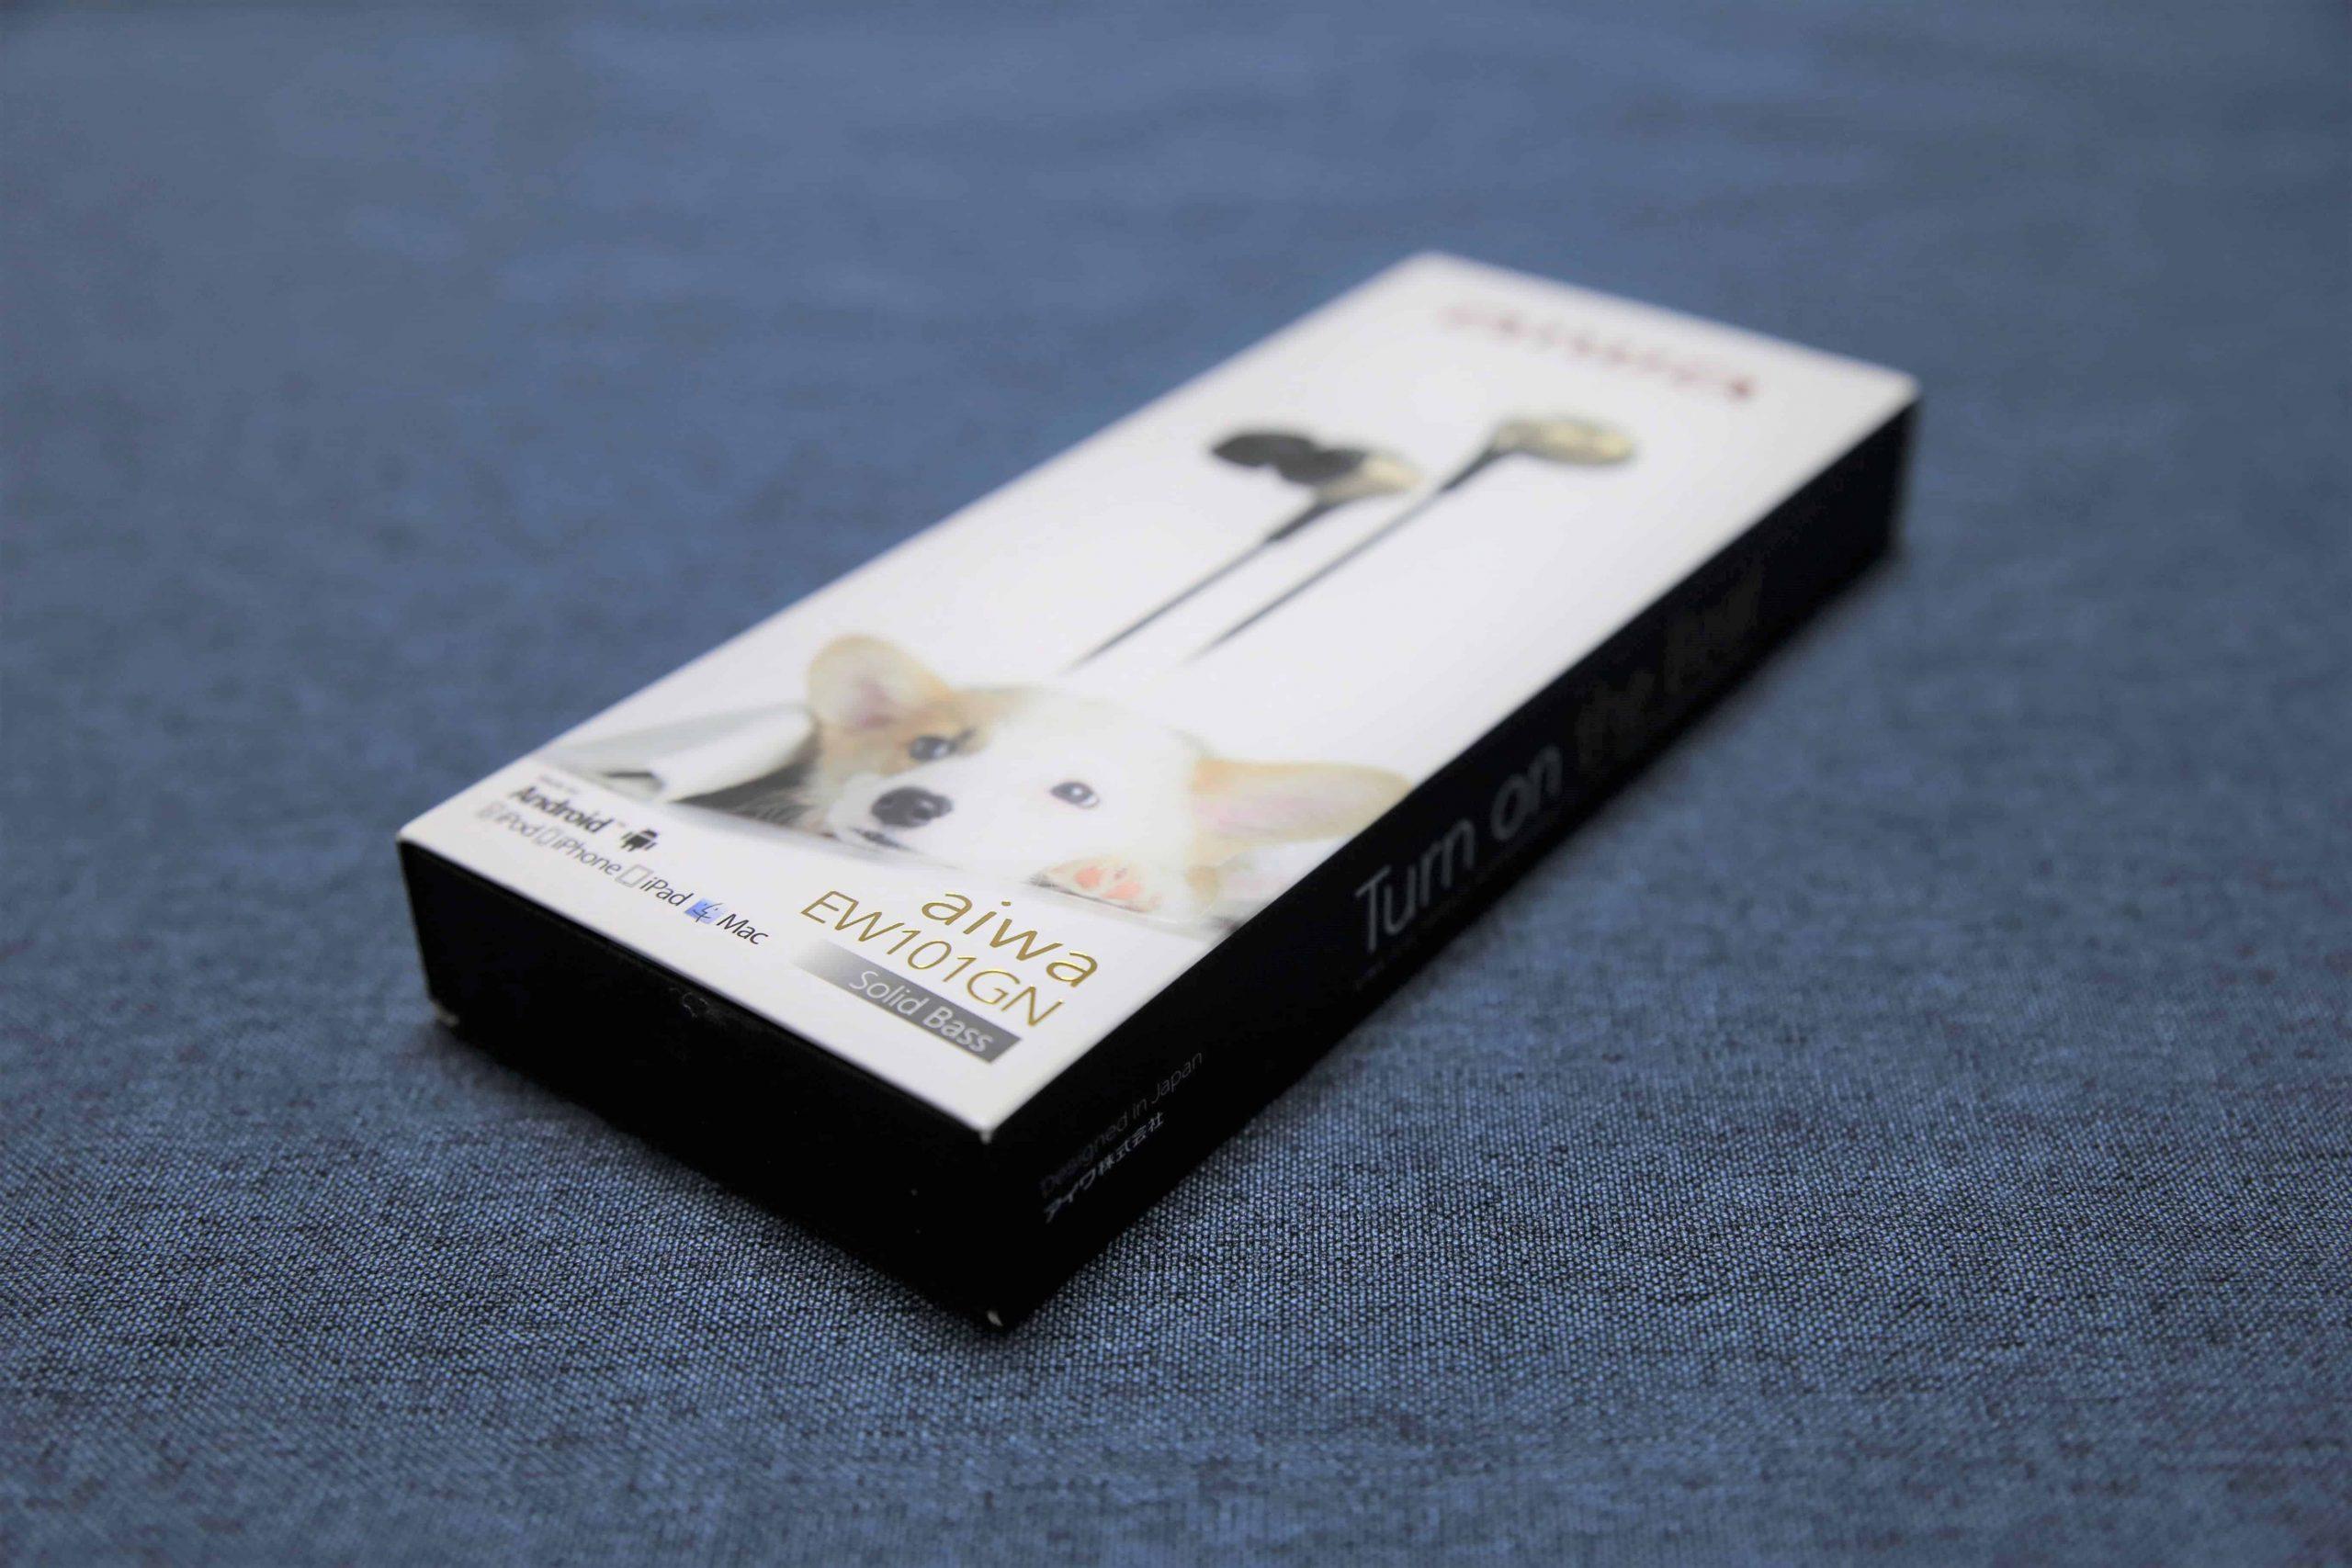 AIWA愛華最新千元內高CP值有線入耳式耳機 - AIWA EW101GN-TechTeller (科技說)